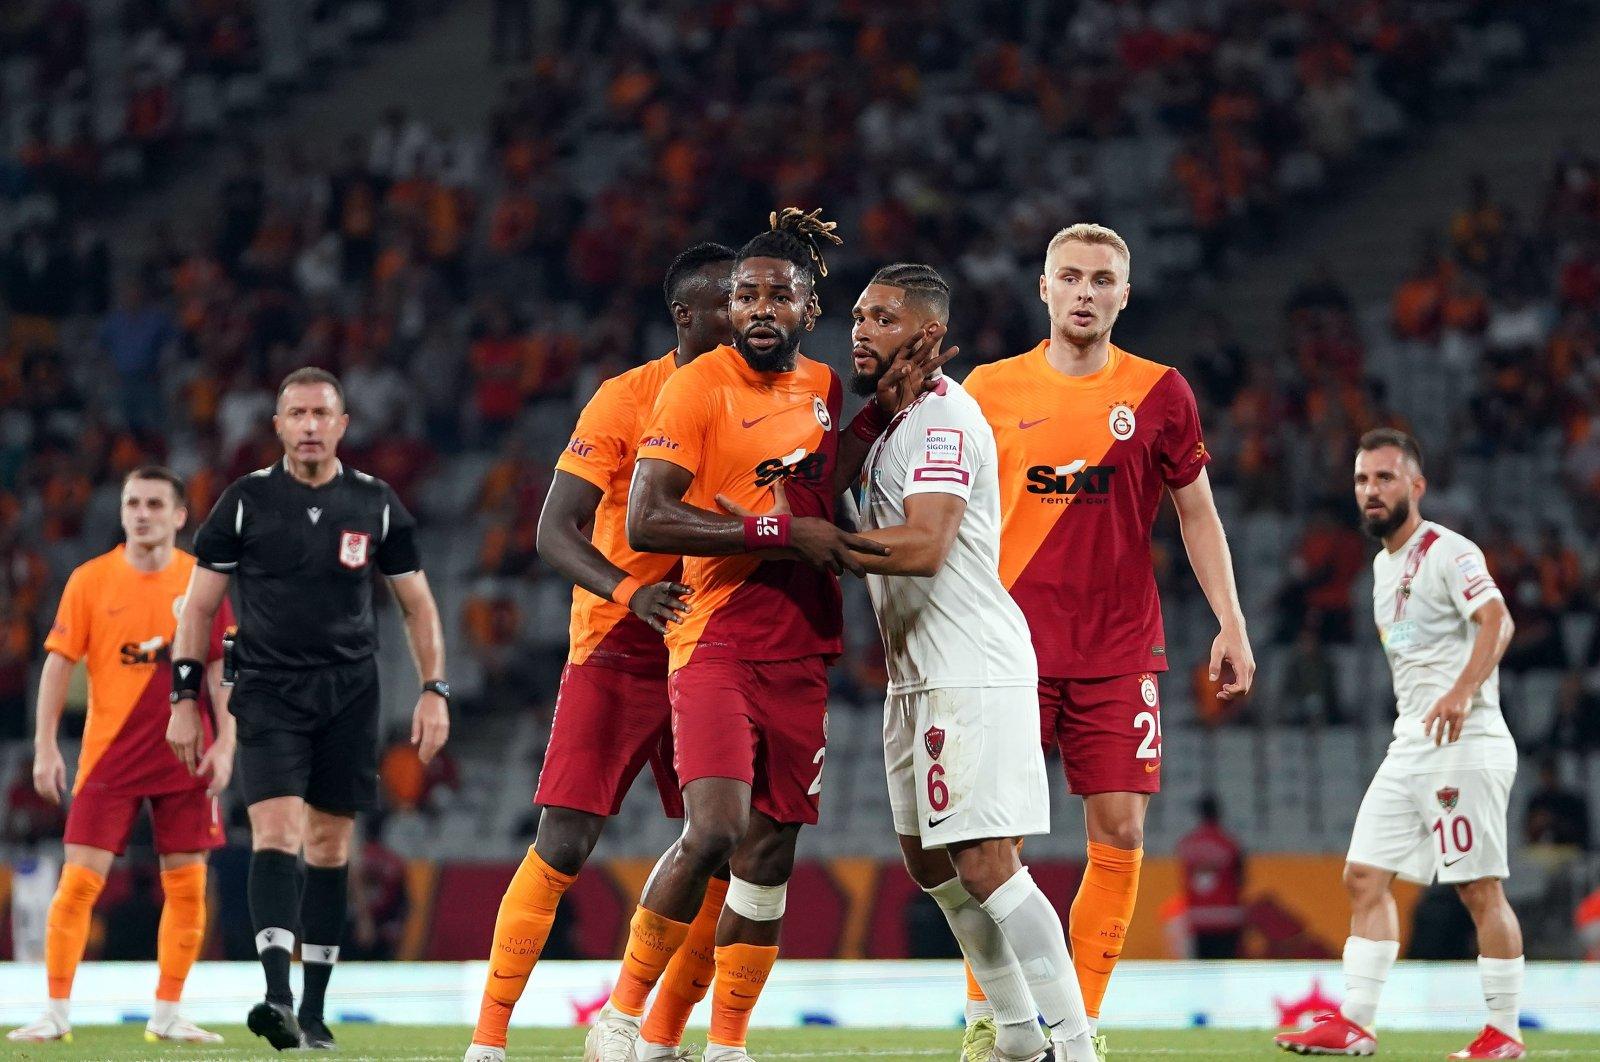 Galatasaray's Christian Luyindama (C) in action with Hatayspor's Jean-Claude Billong during the Turkish Süper Lig match at Istanbul's Atatürk Olympic Stadium, Turkey, Aug. 23, 2021 (IHA Photo)